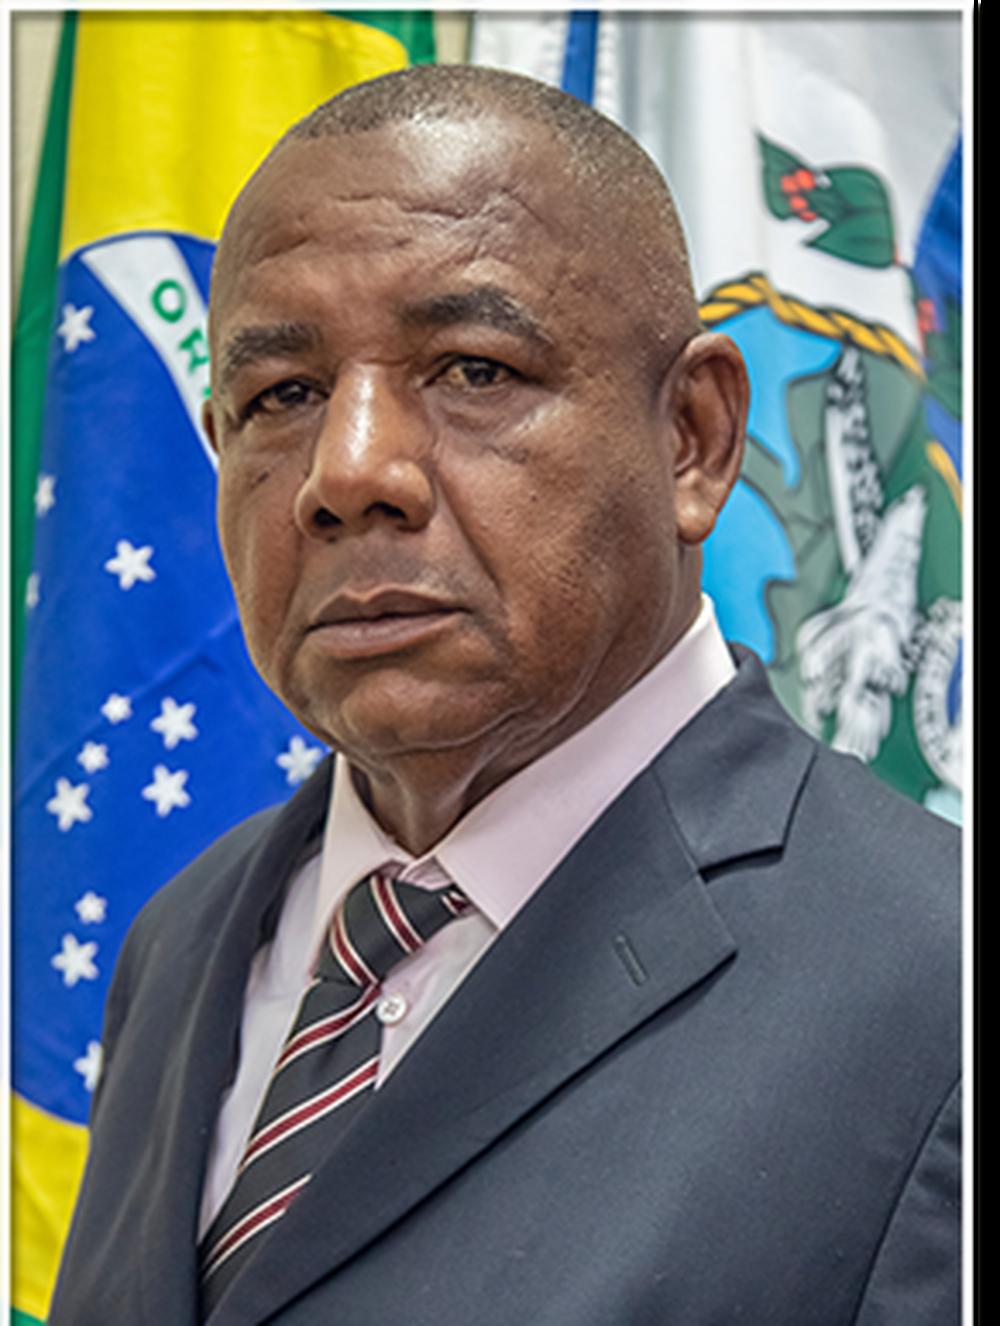 Polícia Civil investiga assassinato de vereador Quinzé, de Duque de Caxias